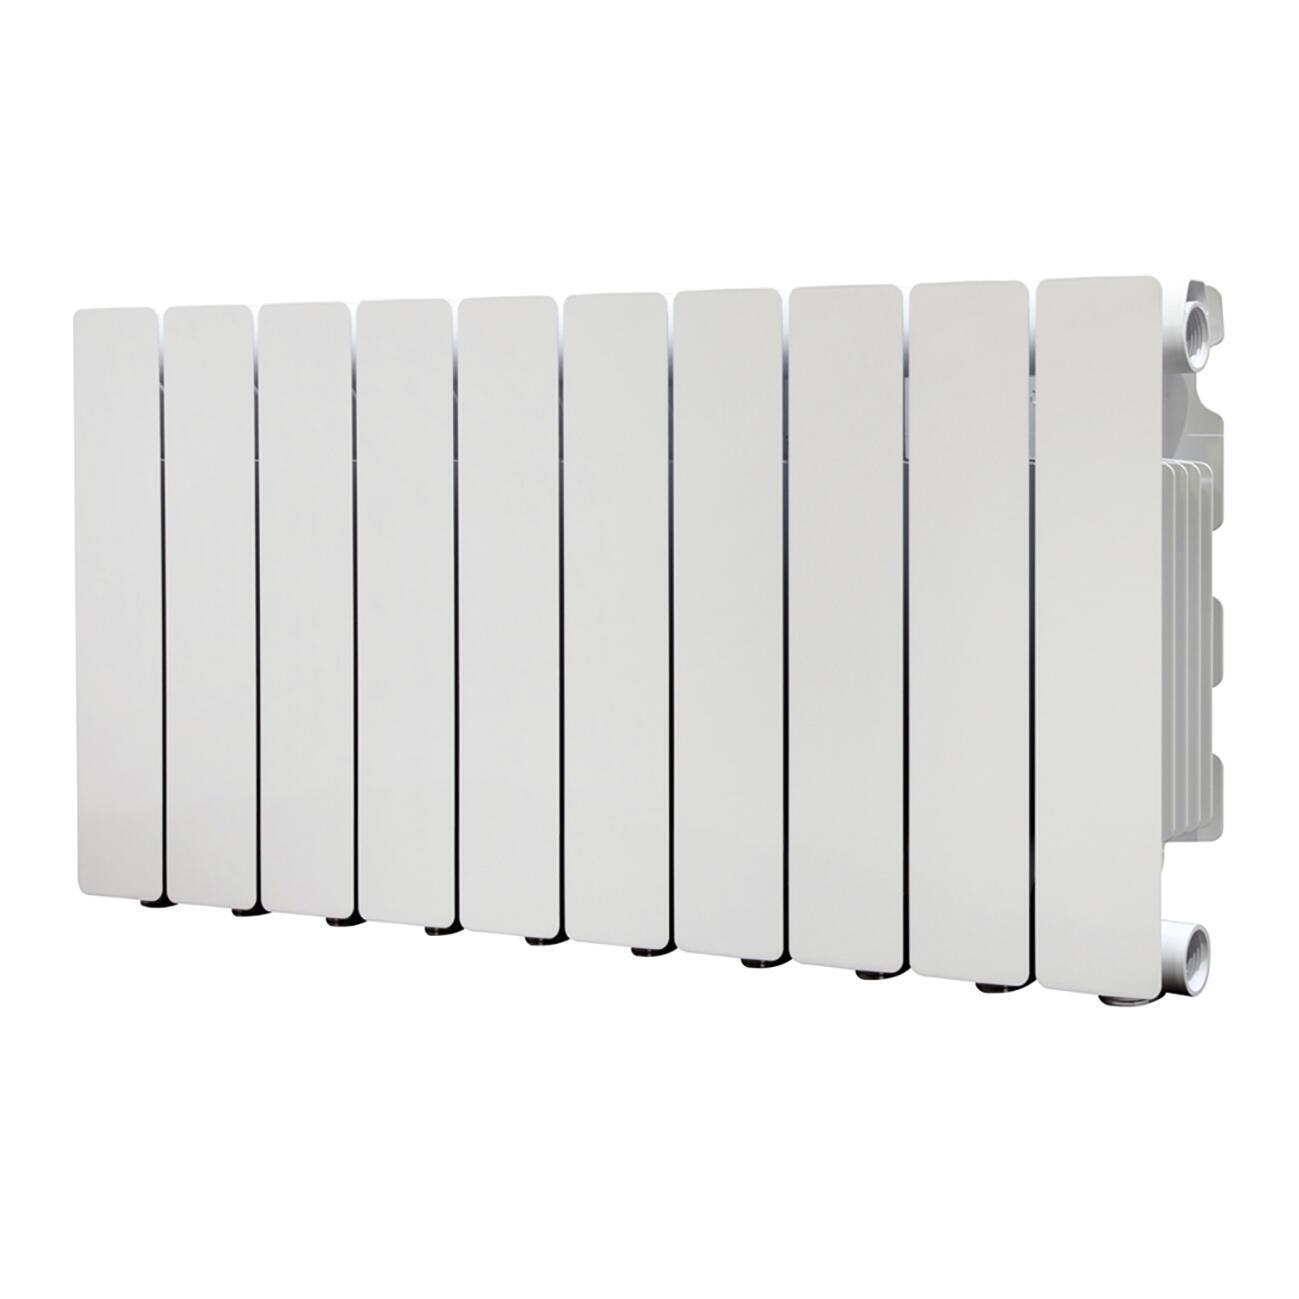 Radiatore acqua calda PRODIGE Modern in alluminio 10 elementi interasse 35 cm - 3